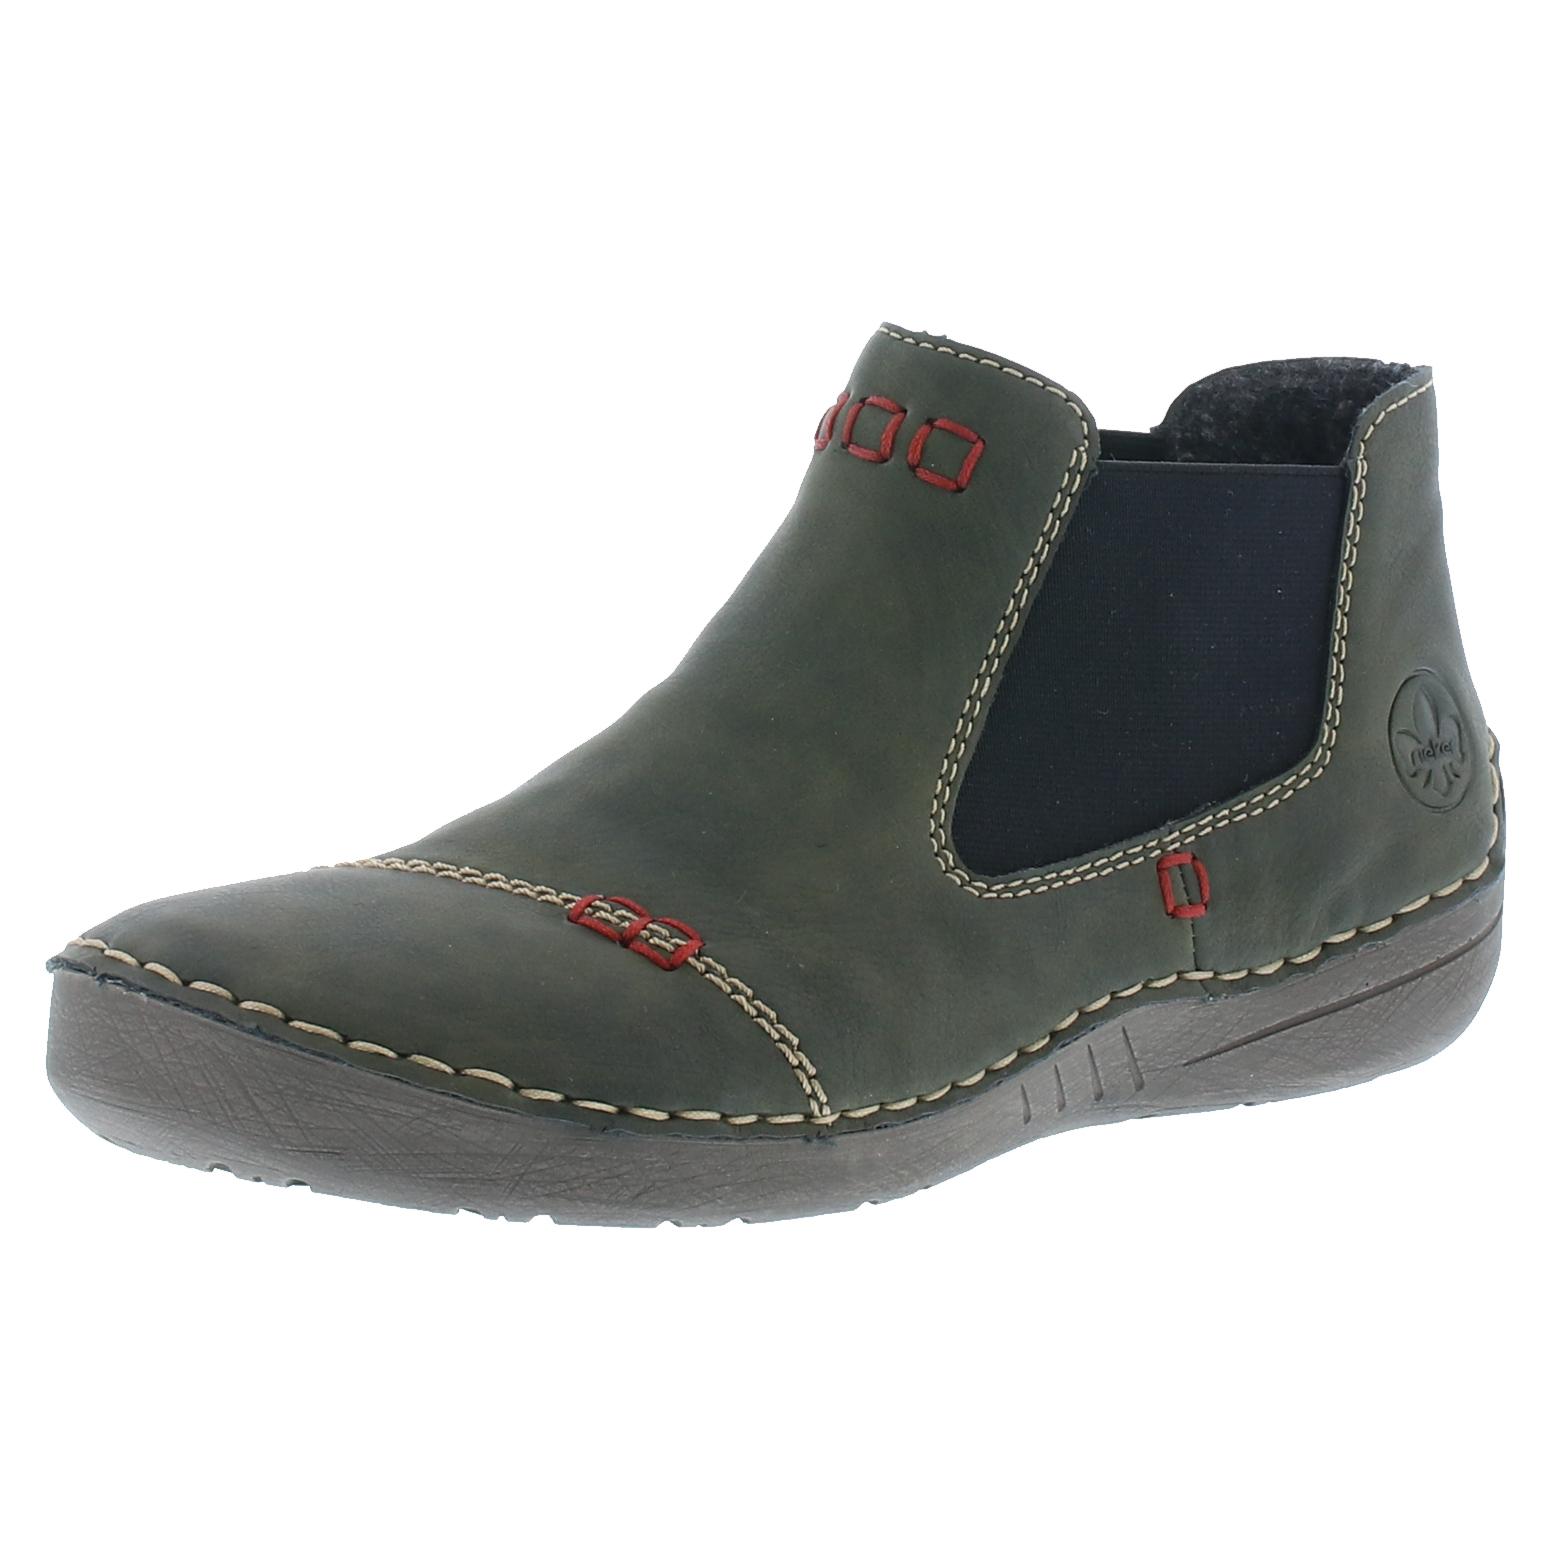 reputable site 14152 4b923 Details zu Rieker 52590 Schuhe Damen Stiefeletten Chelsea Boots Warmfutter